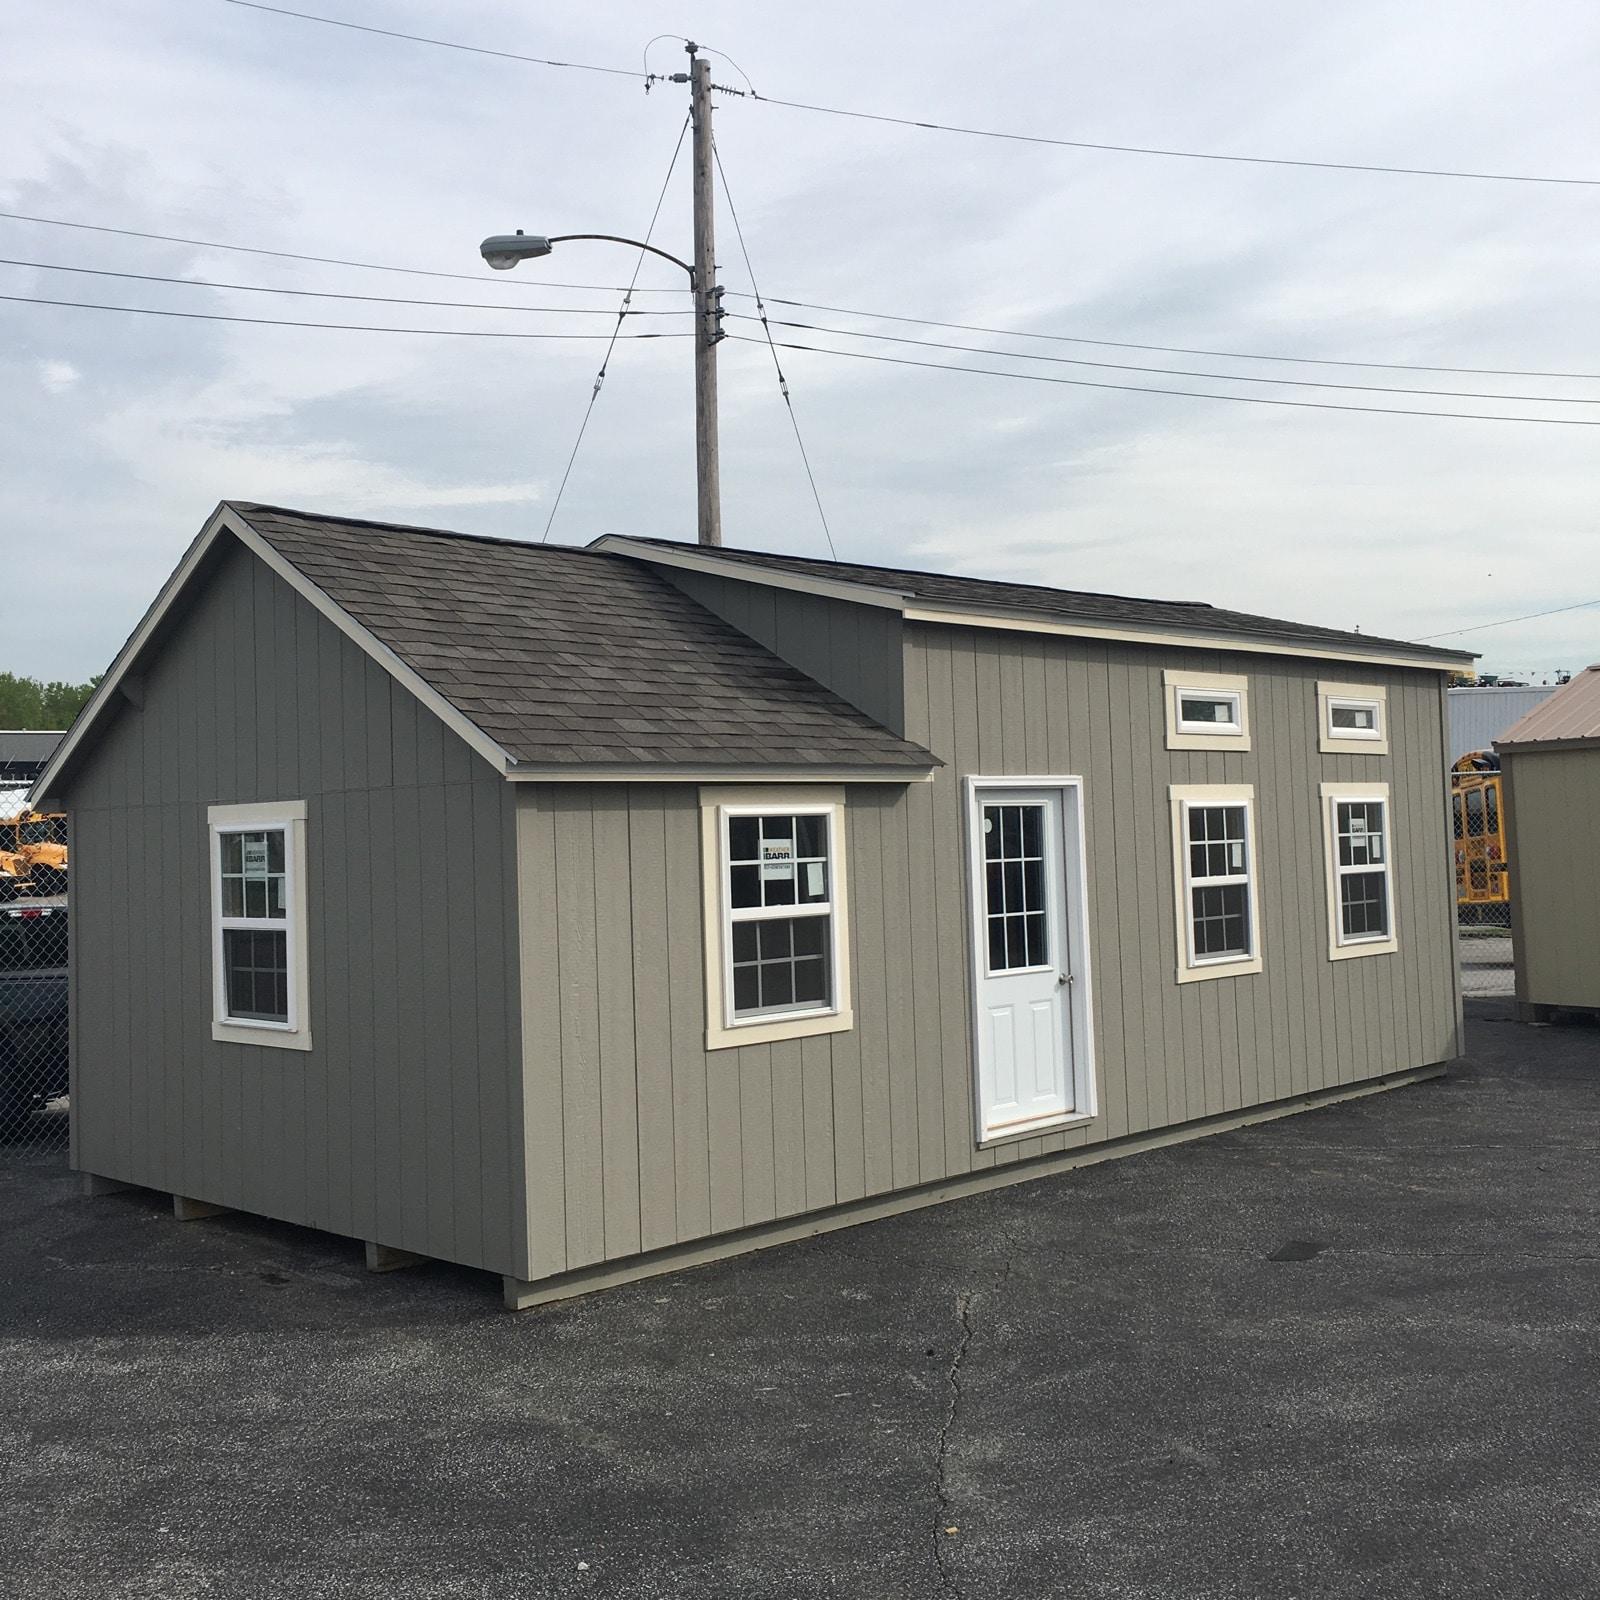 Tiny Houses > Portable Buildings Storage Sheds Tiny Houses